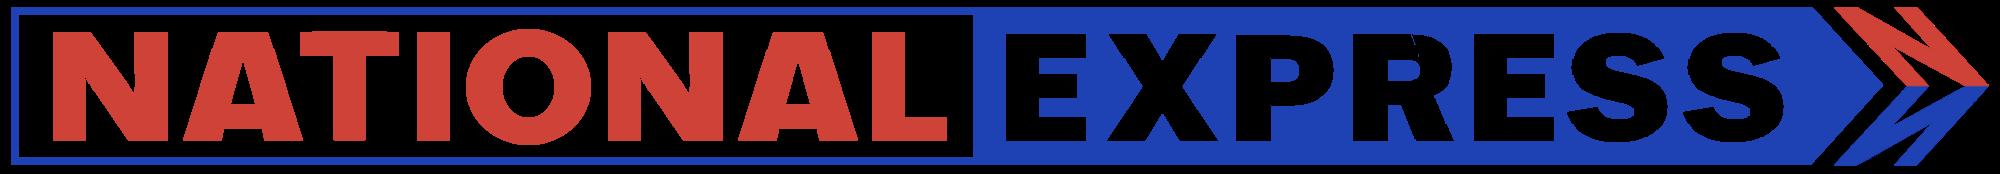 National Express logo 1991